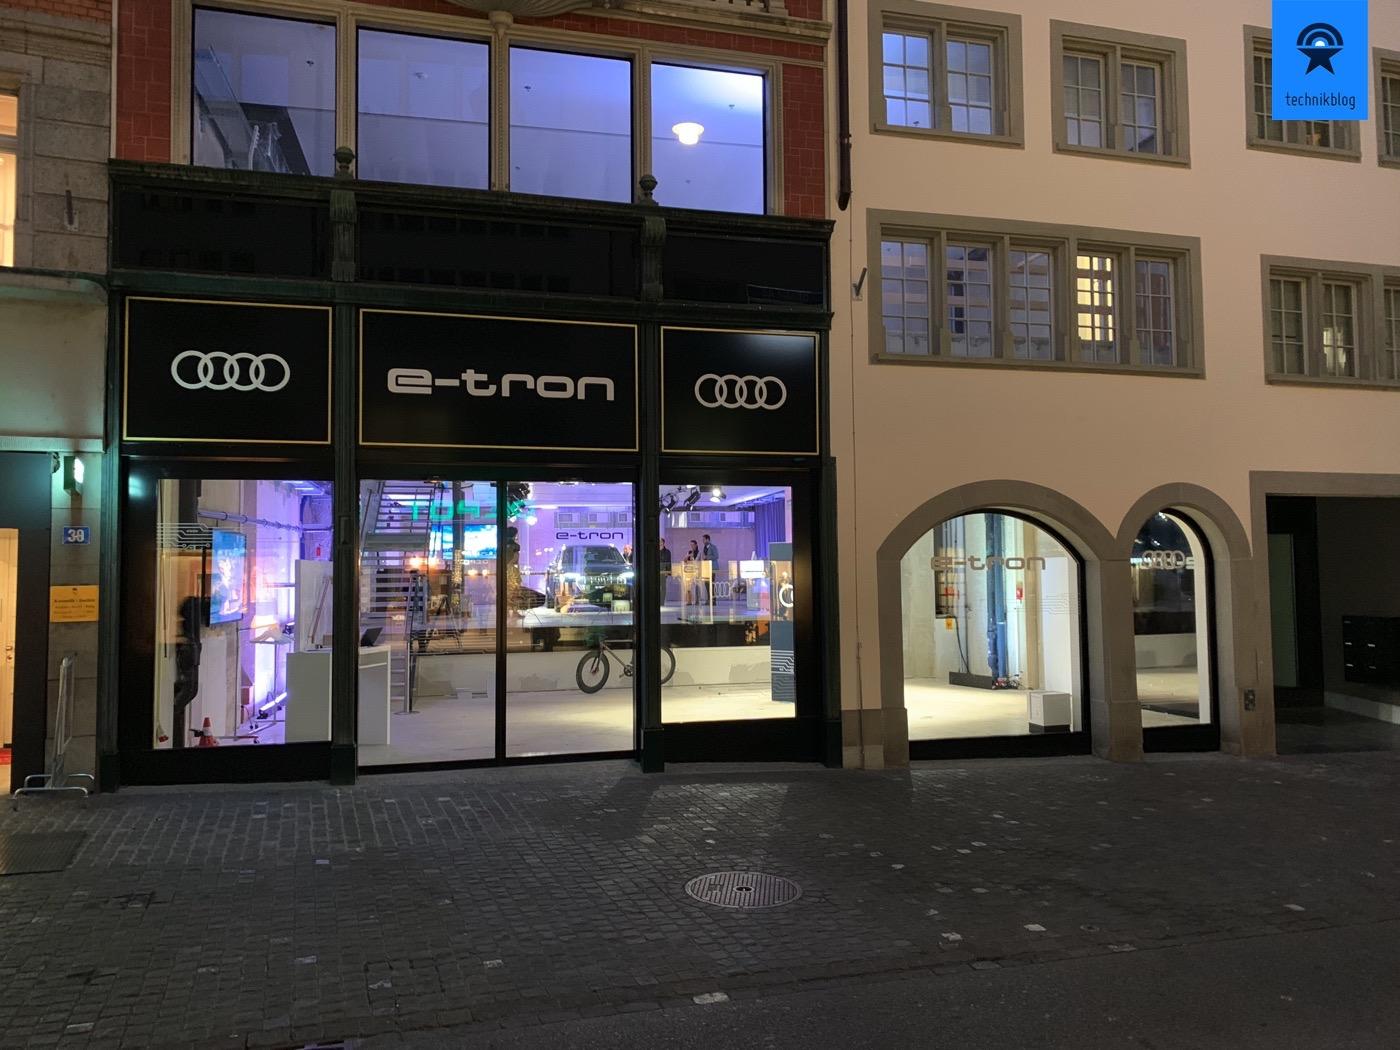 Audi e-Tron Pop-Up Store in Zürich